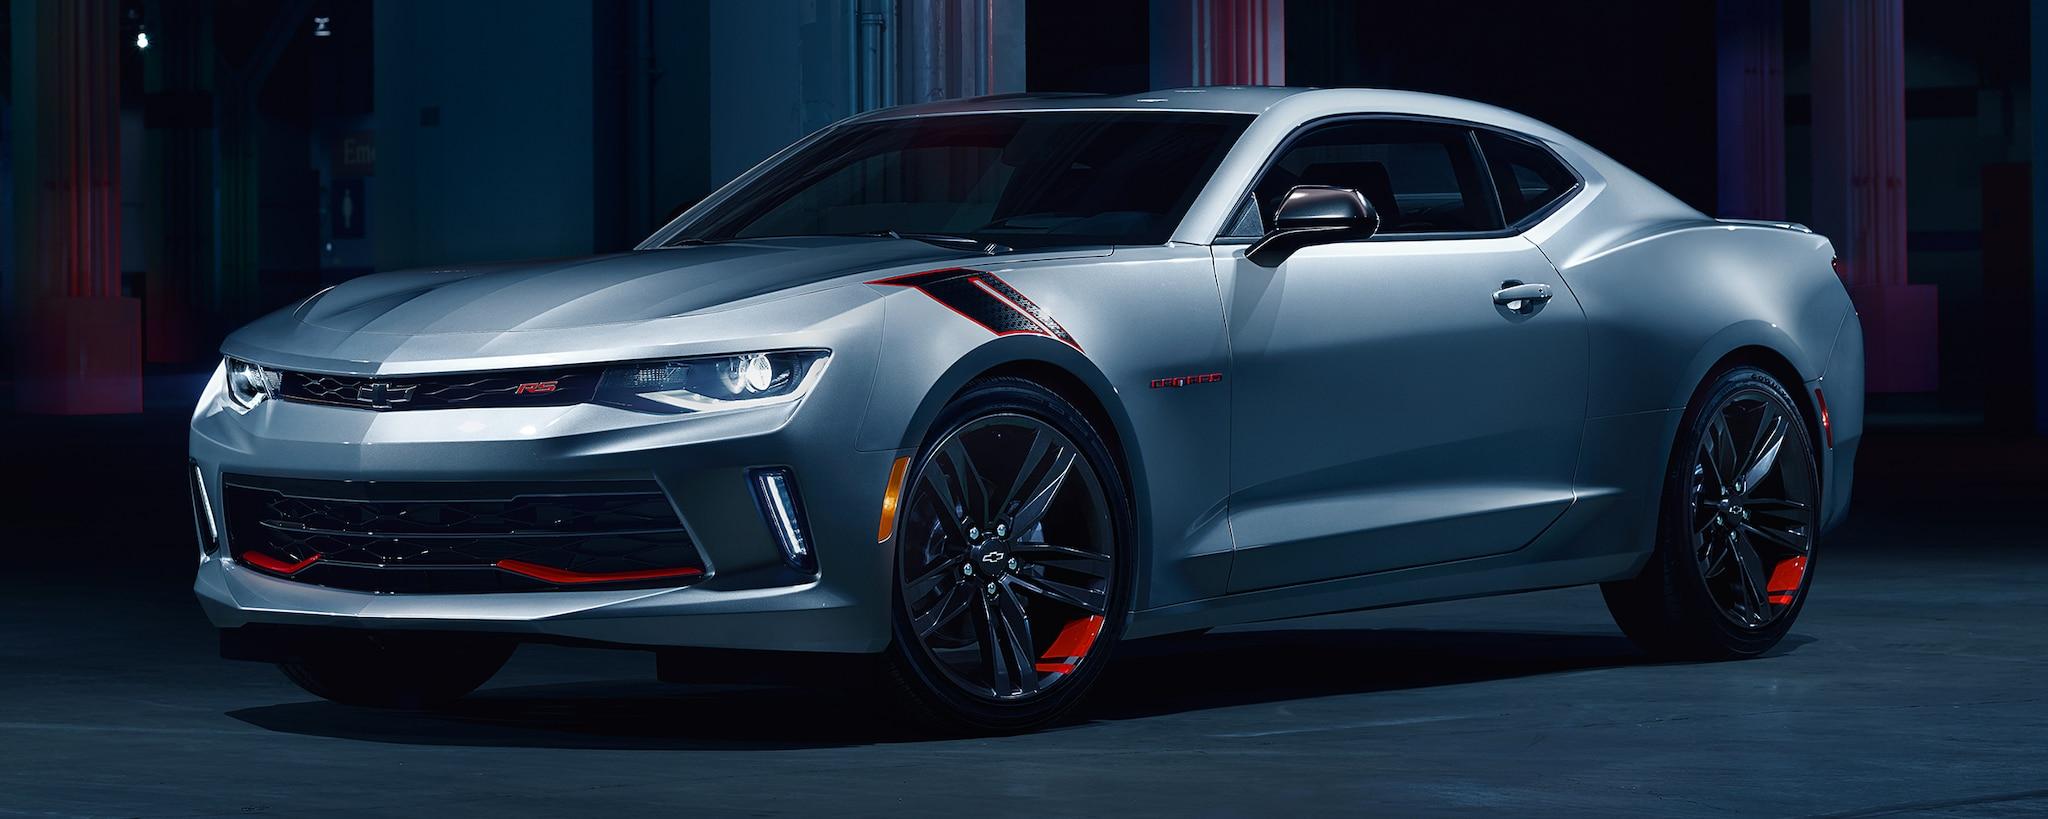 Diseño del auto deportivo Camaro 2018: Serie Red Line